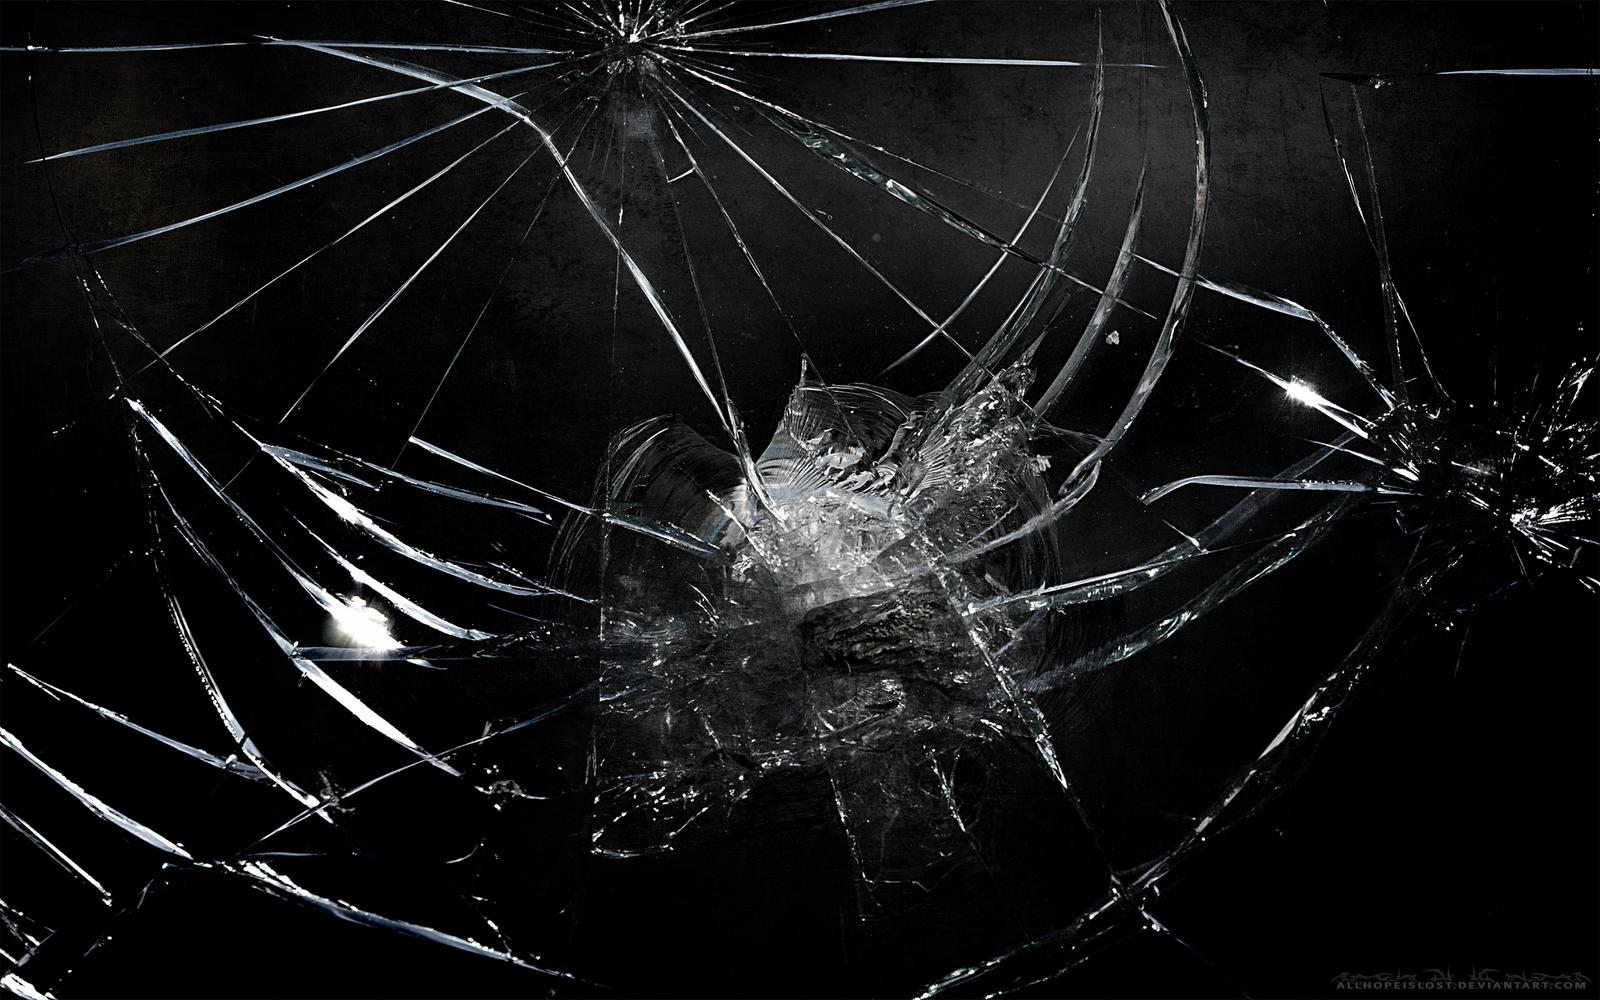 Hd Cracked Screen Wallpaper – wallpaper202